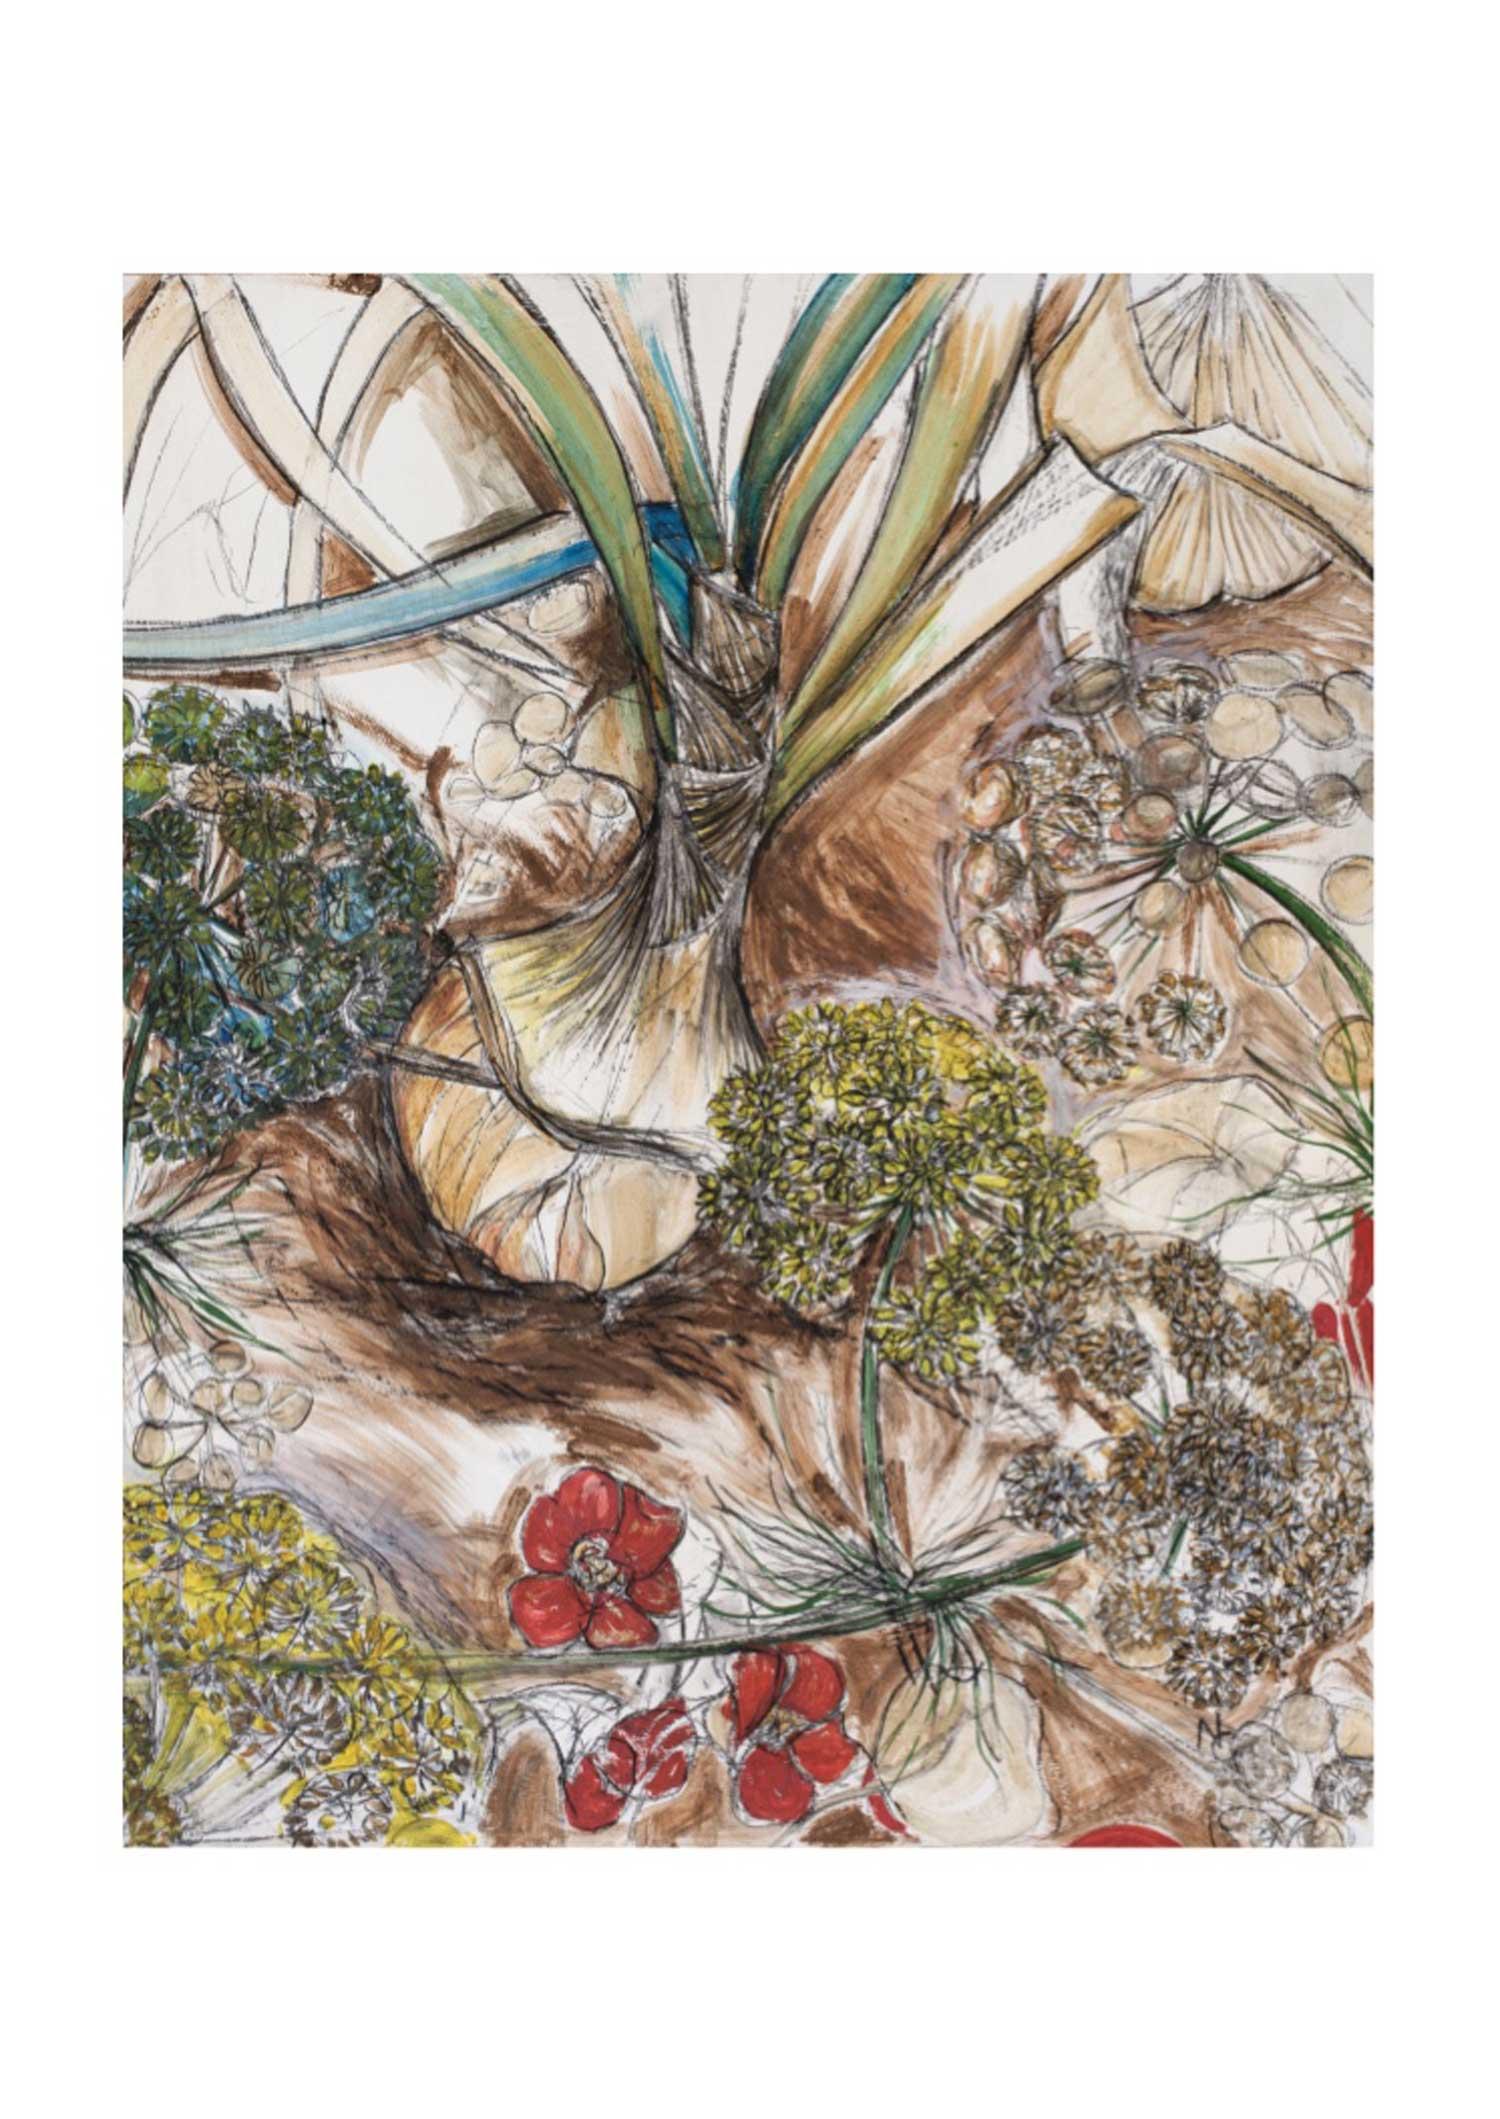 natasha-clutterbuck---giant-fennel-&-onions.jpg